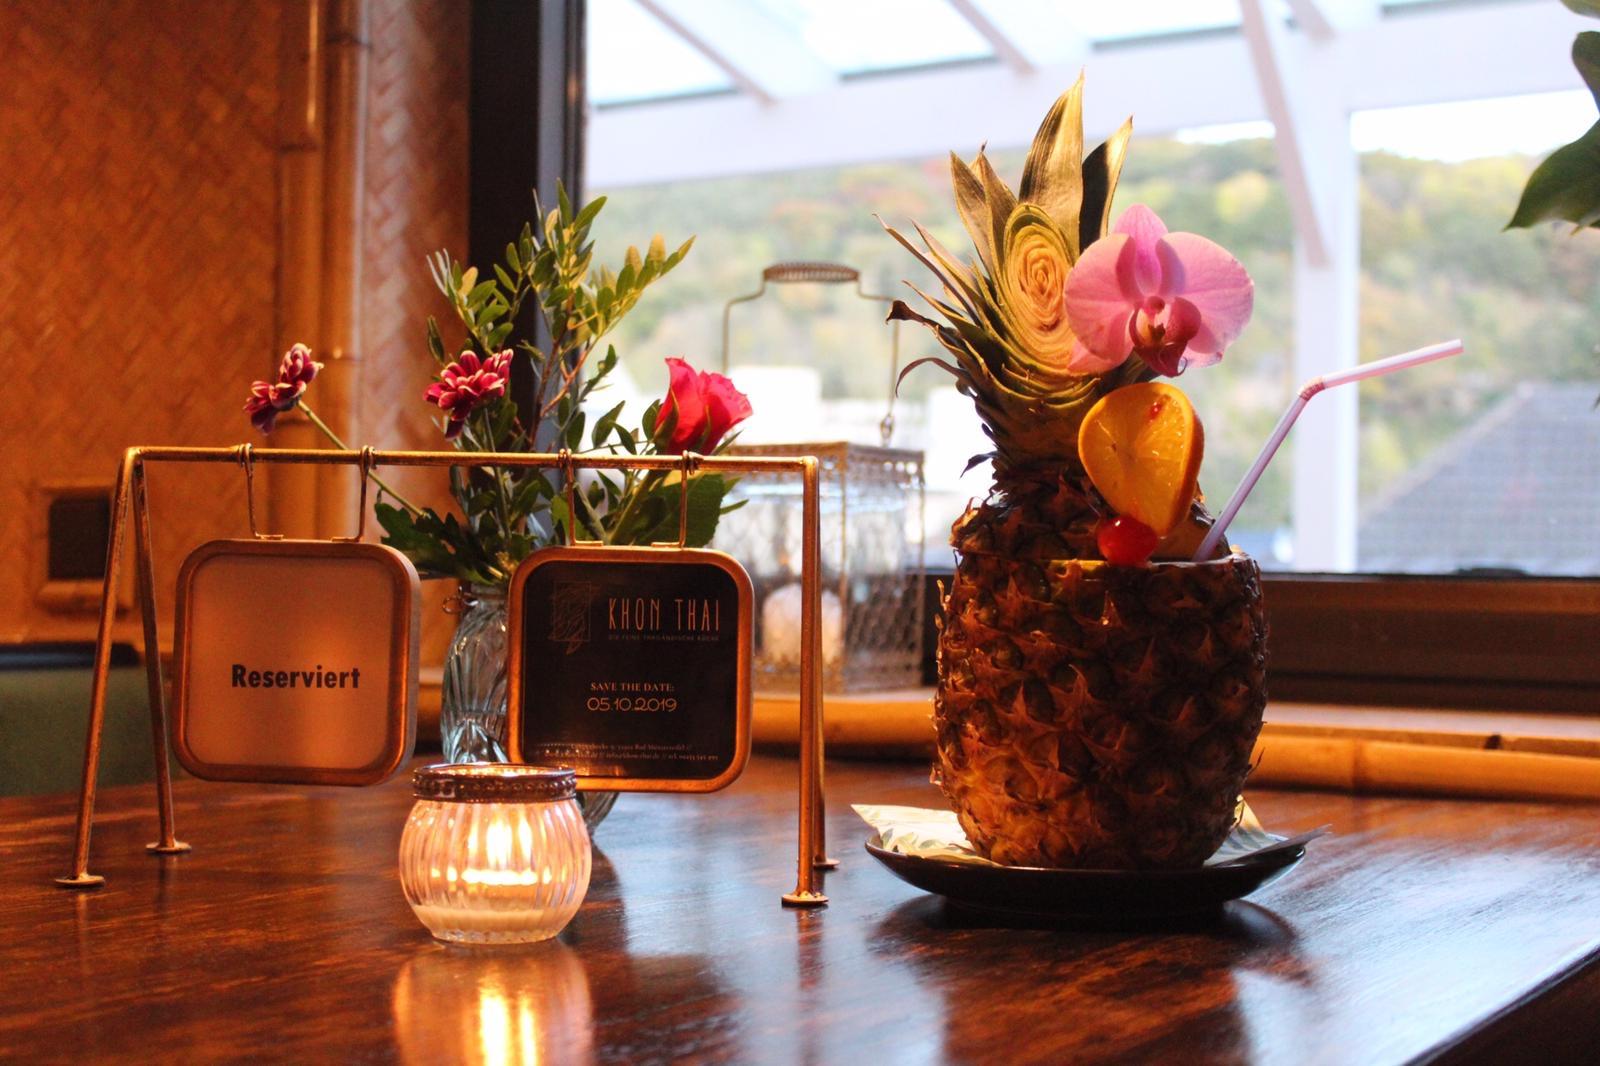 khon-thai-restaurant-ambiente-ananas